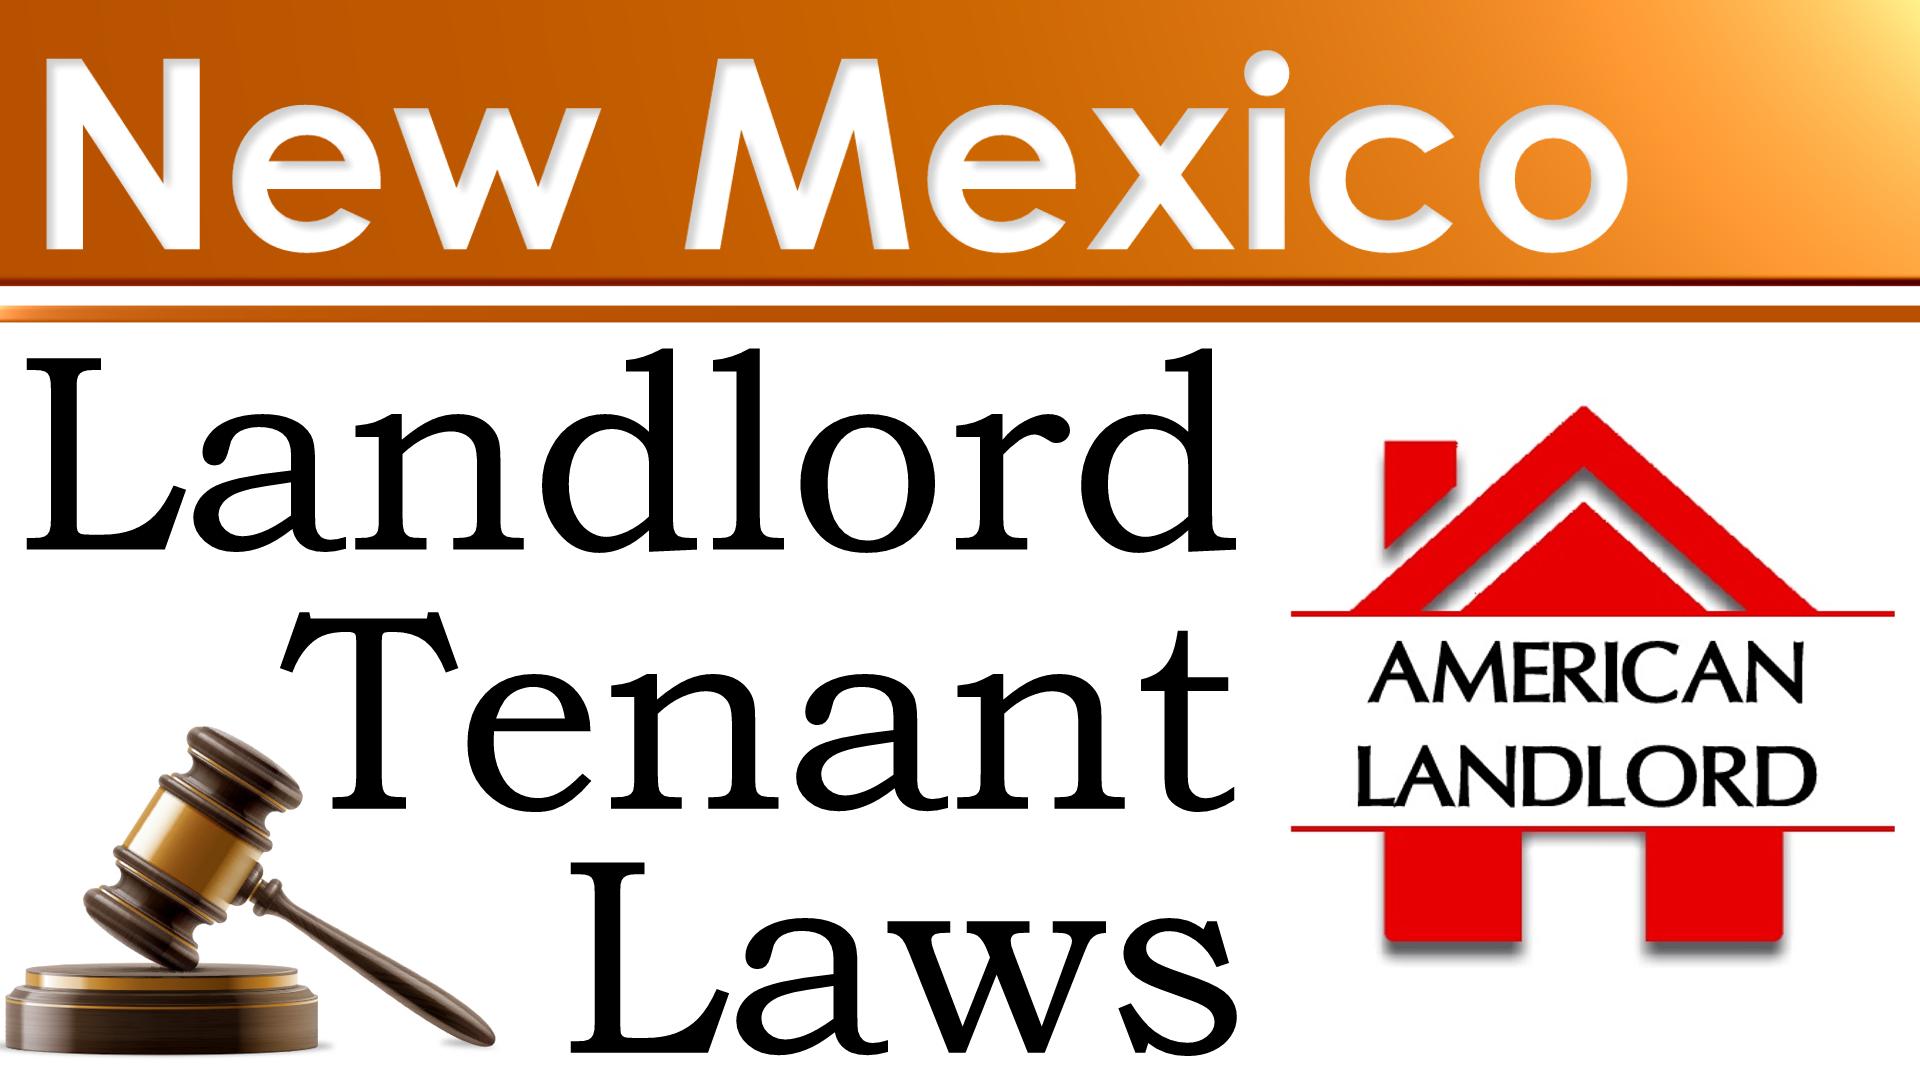 New Mexico landlord tenant law